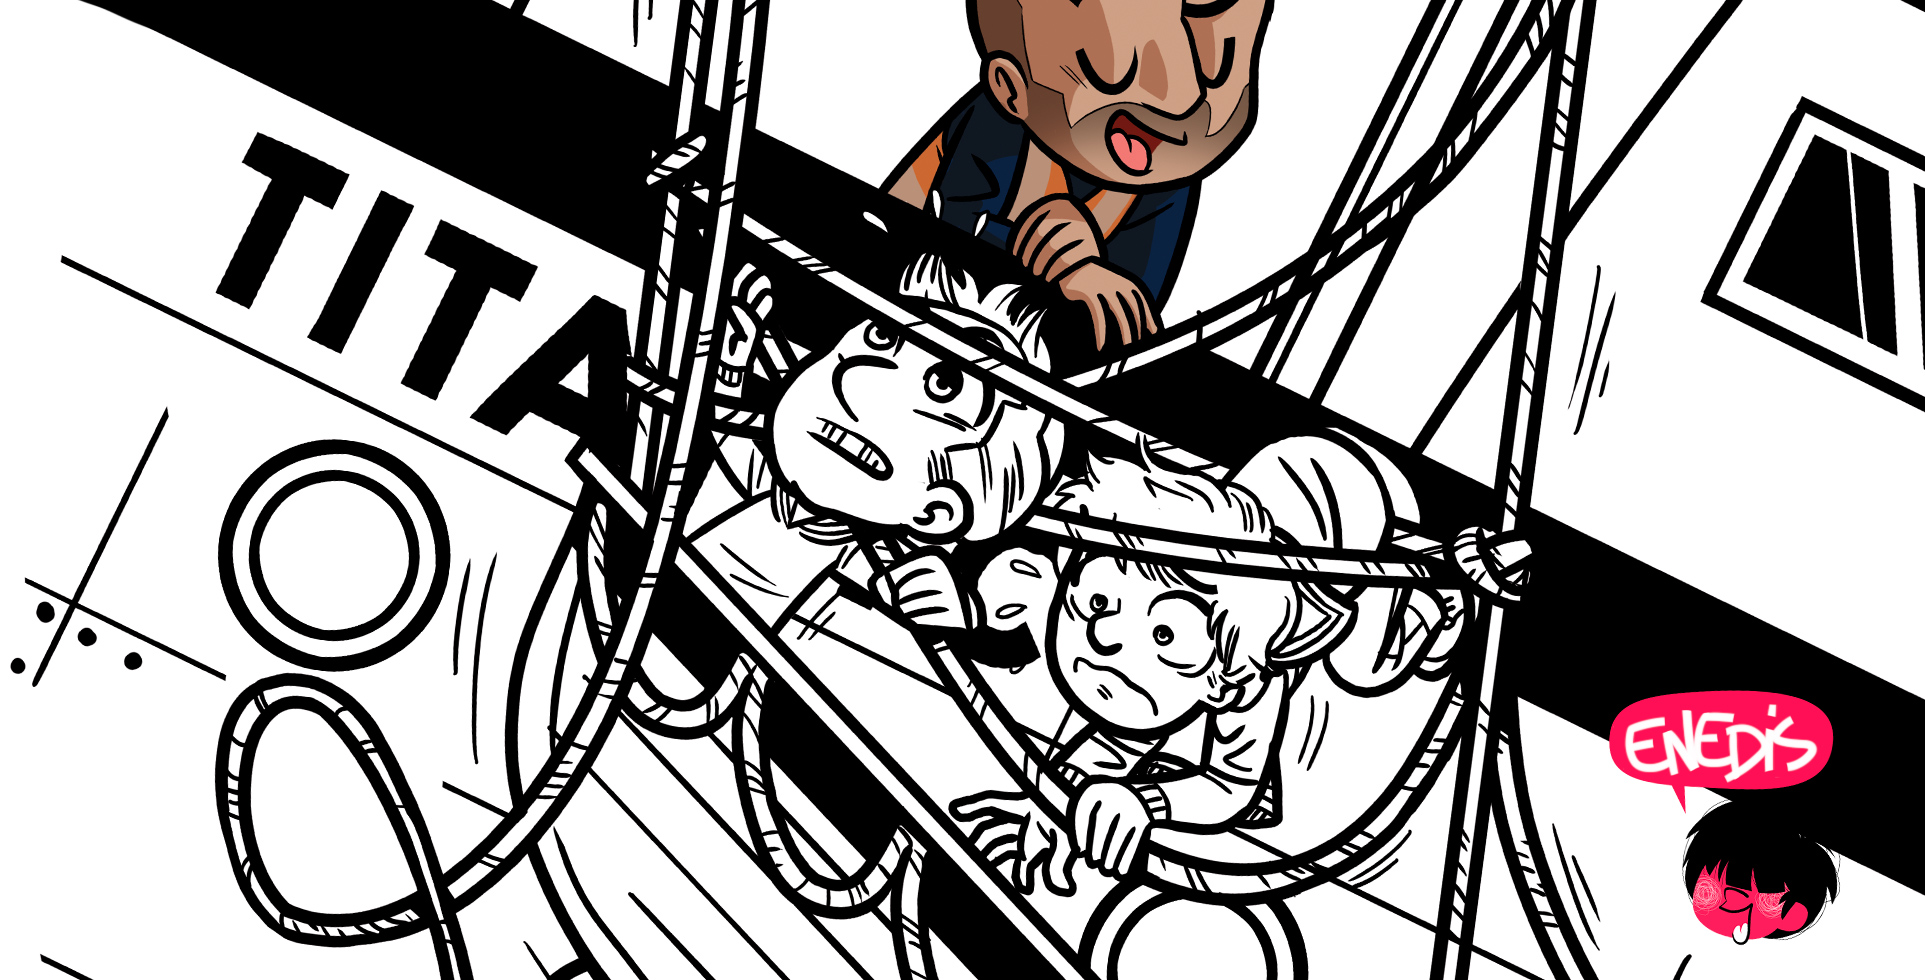 enedis-mascotte-illustration-Mouk-gaetan le cose-illustrateur-brest-brestois